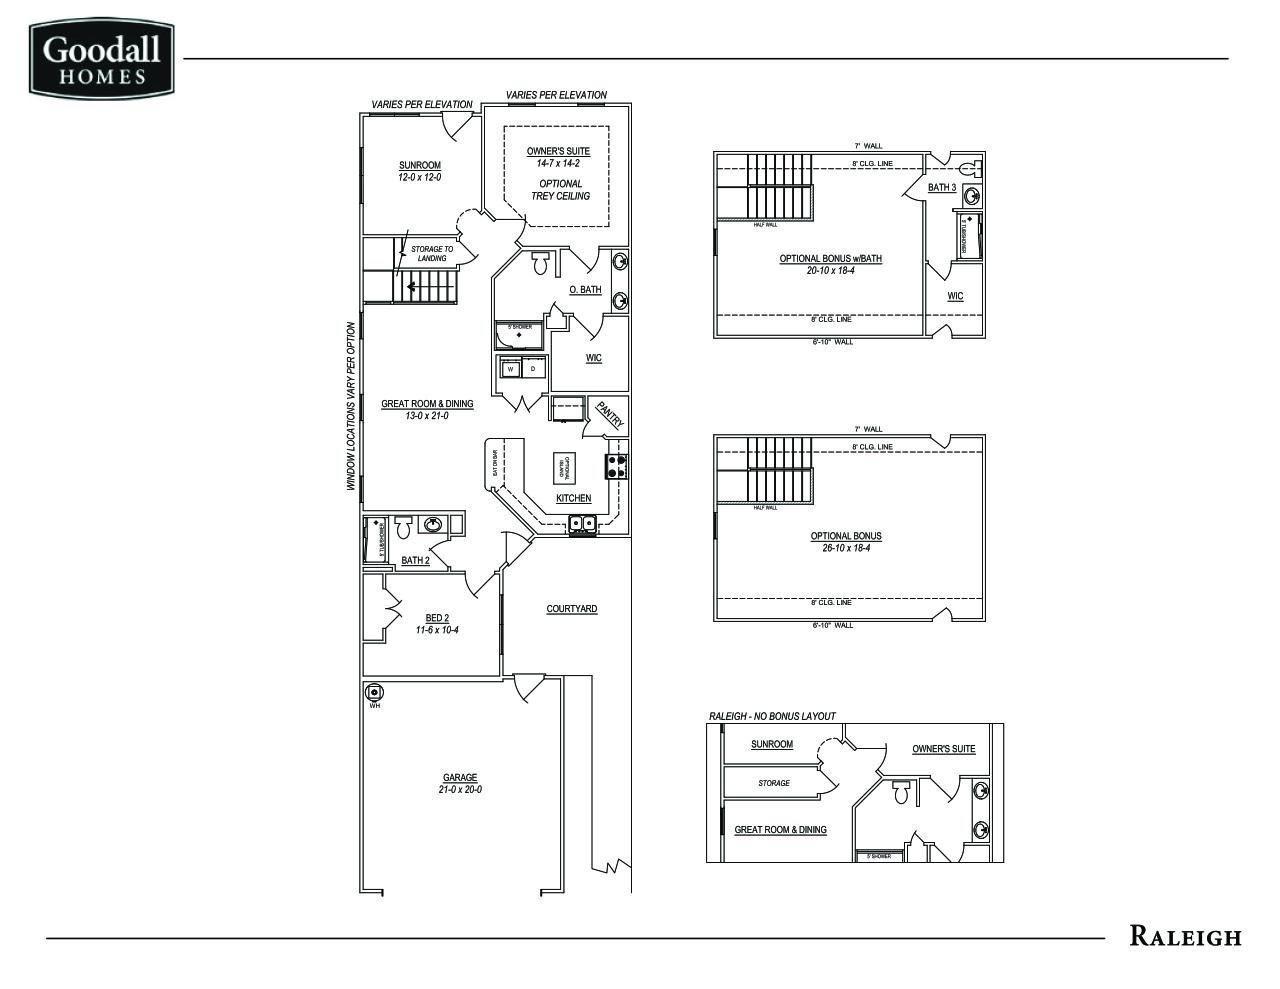 1642 Foston Lane, Gallatin, TN 37066 - MLS#: 2217017